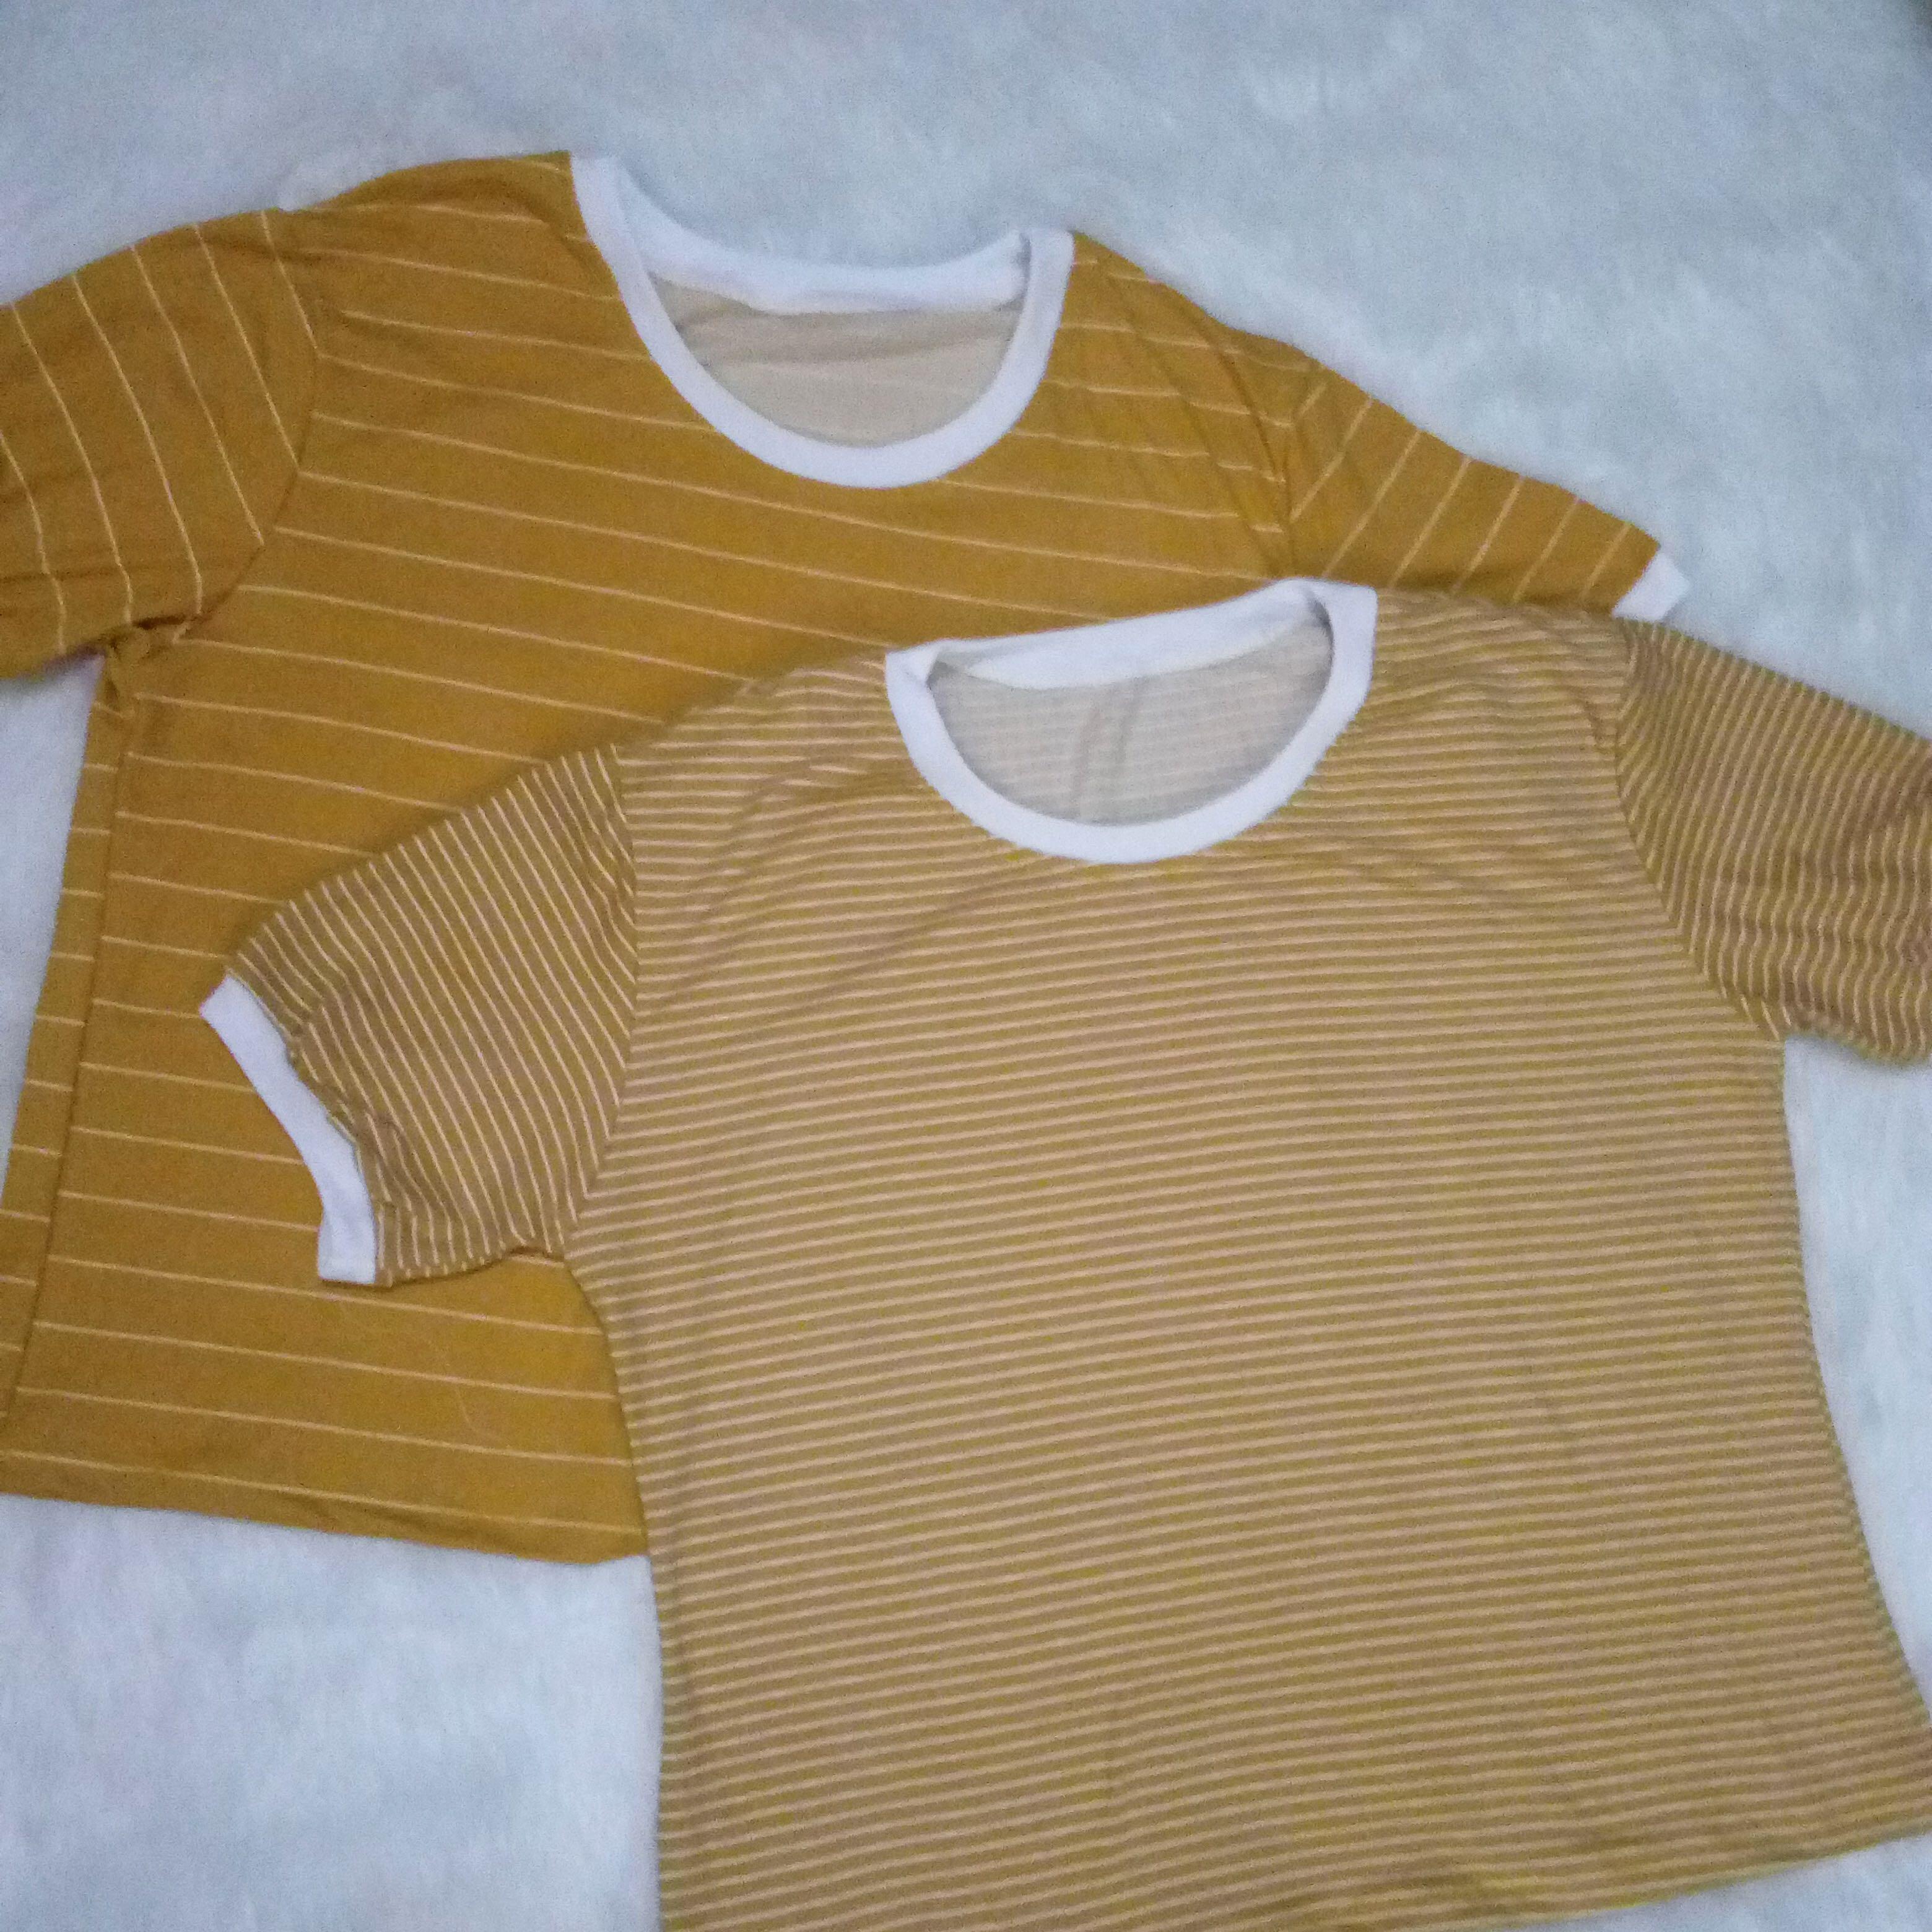 524b6cd33e Mustard Yellow striped shirt, Women's Fashion, Clothes, Tops on ...